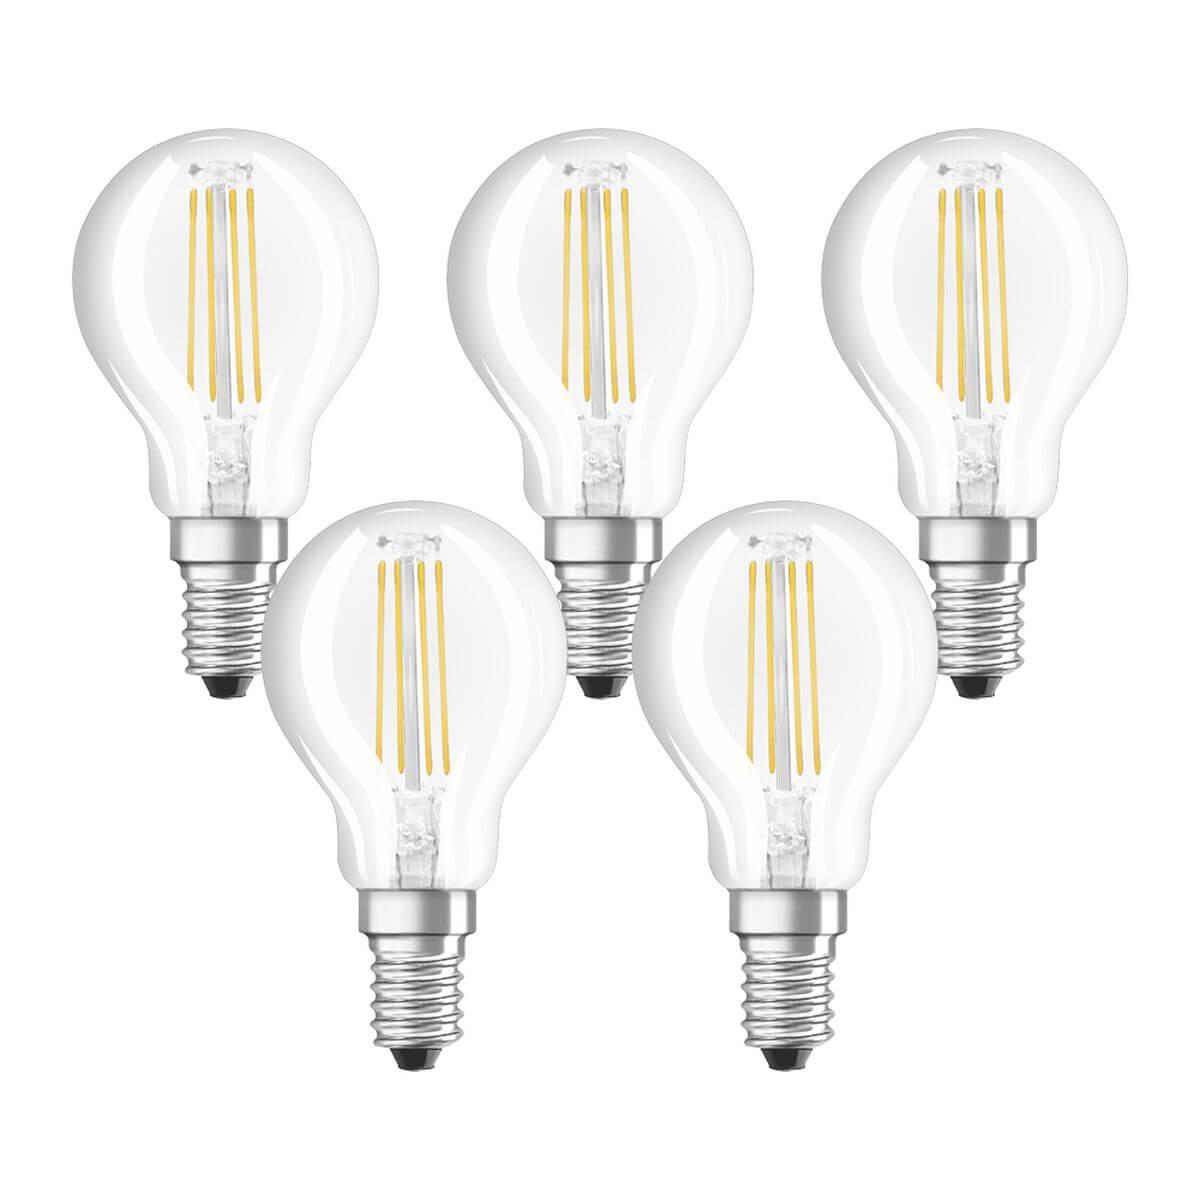 E14 LED Lampen & Leuchtmittel >> Hier im Shop kaufen